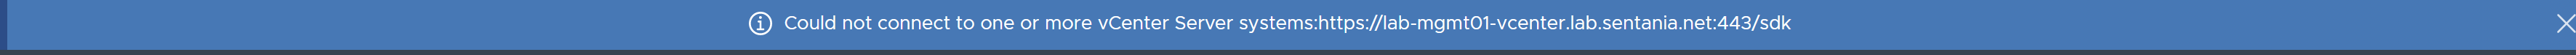 Offline VCSA Error